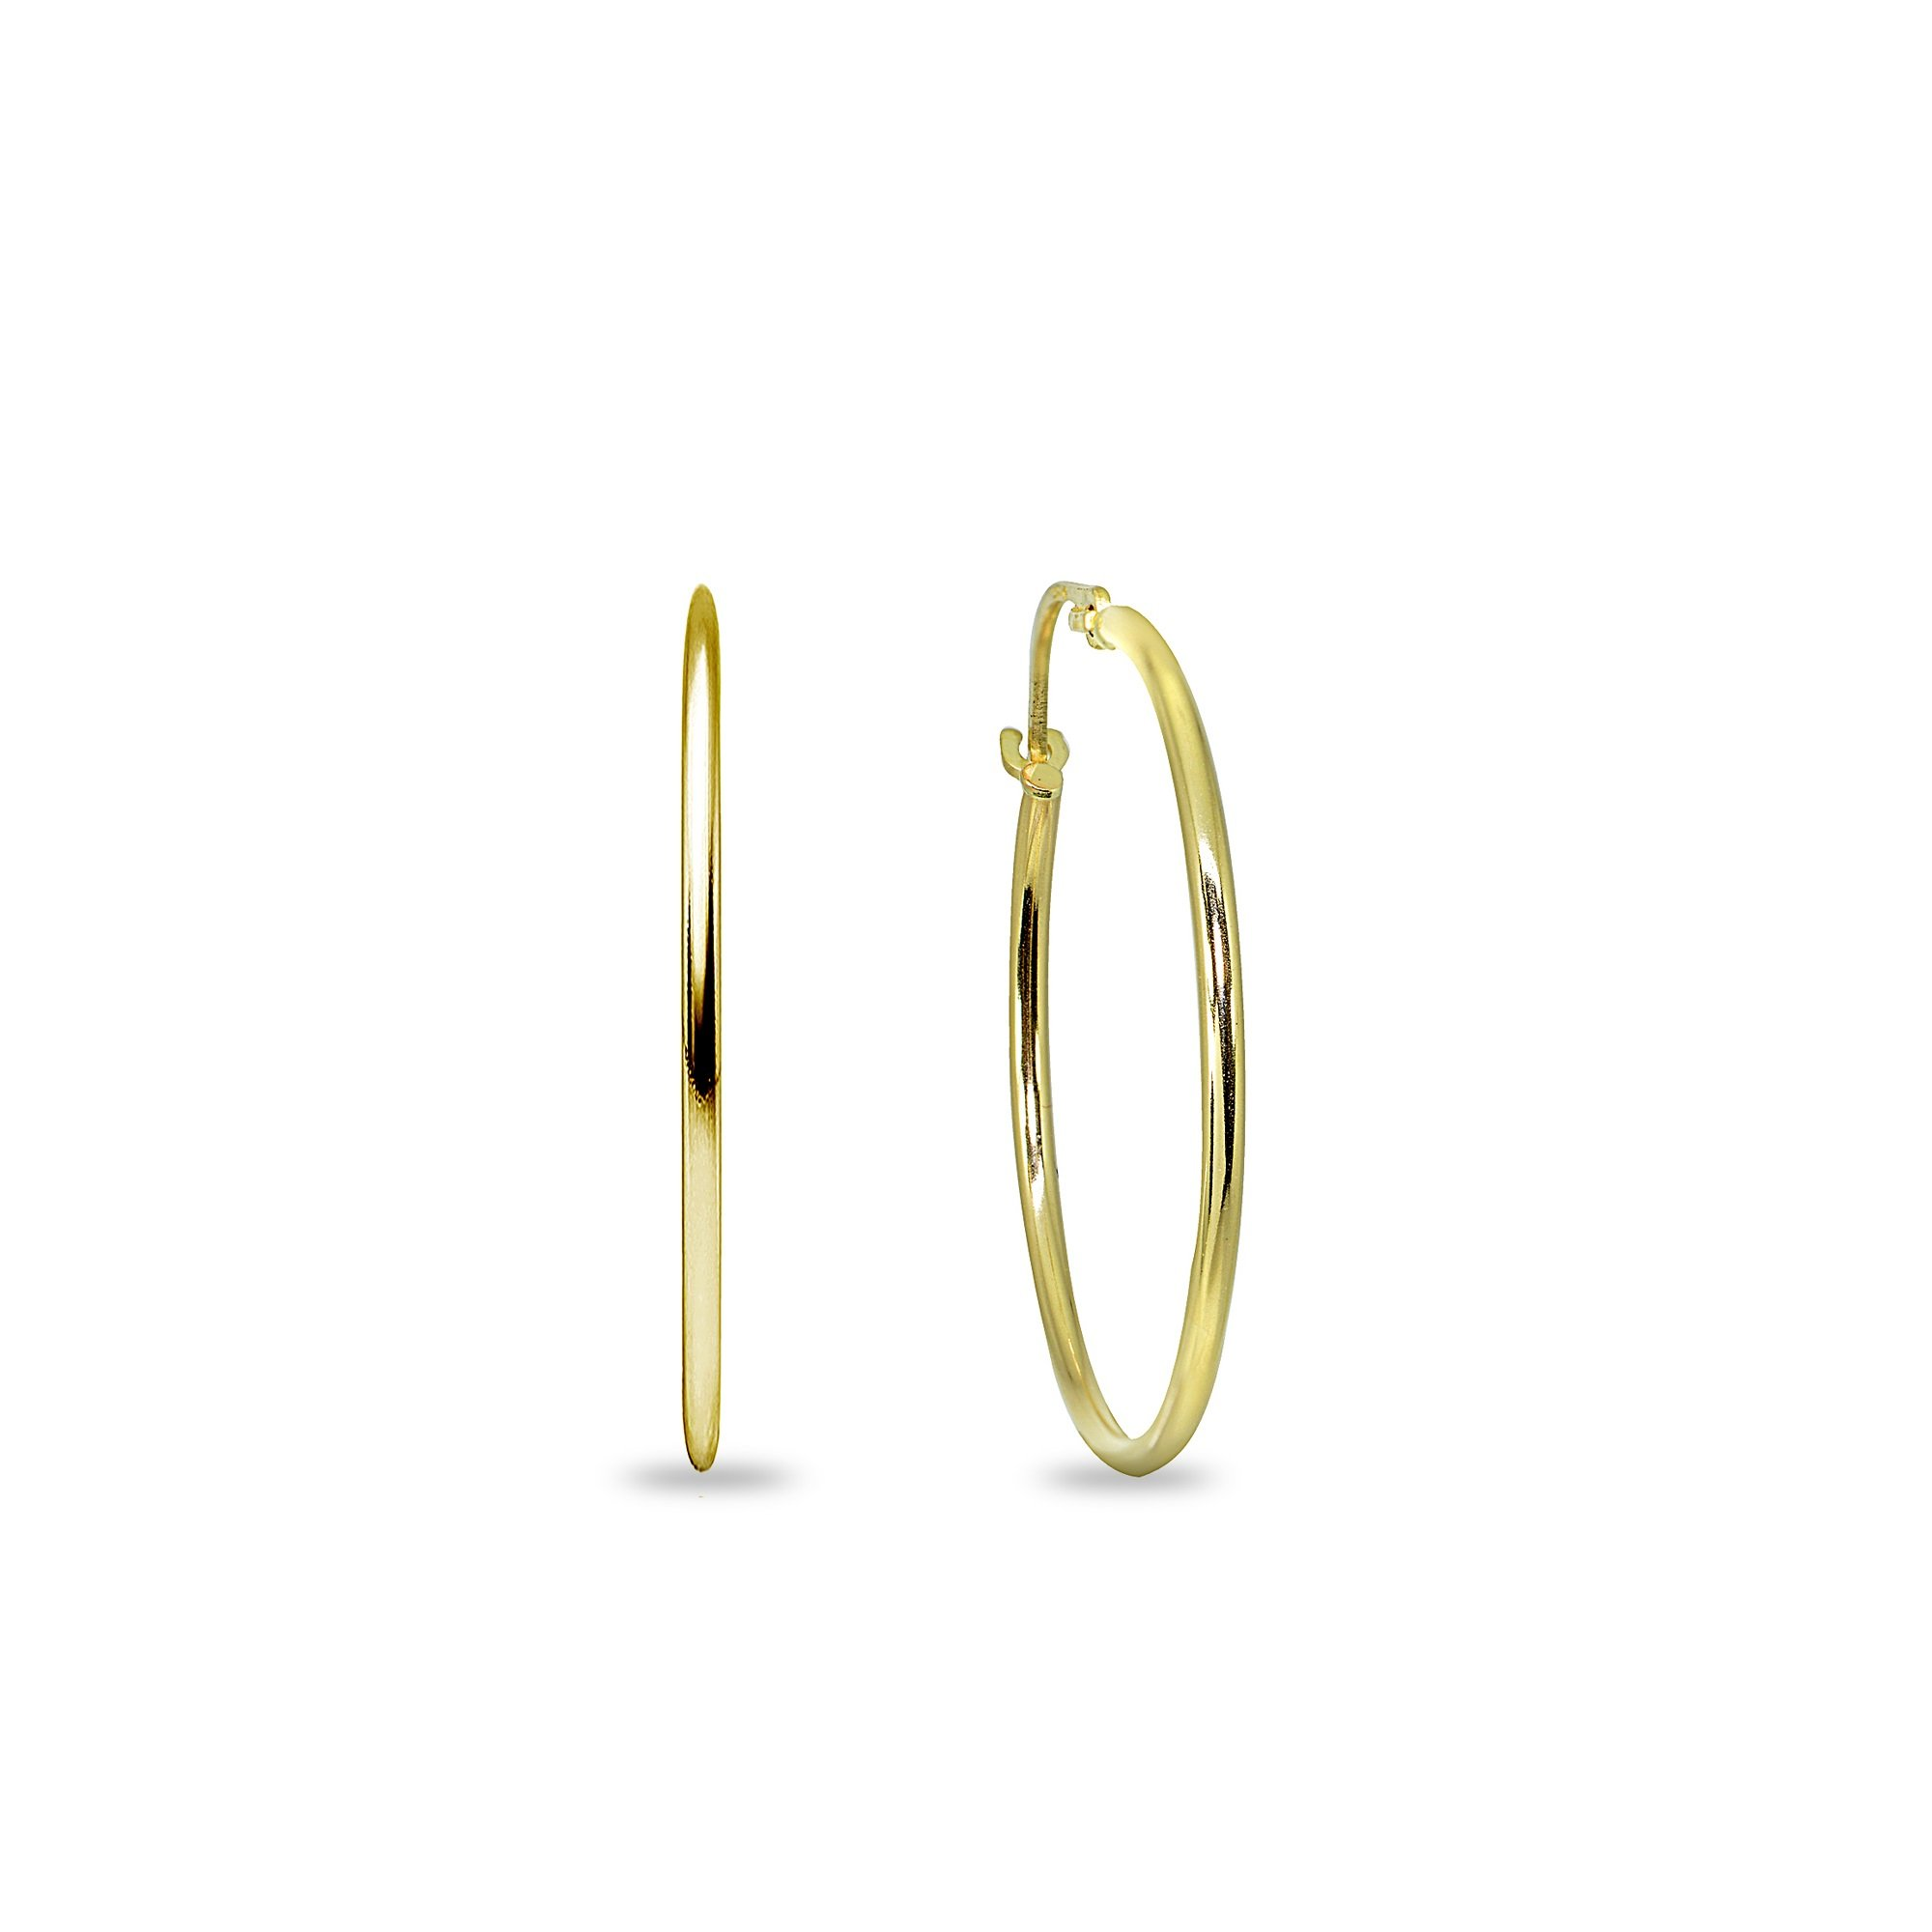 14K Yellow Gold 3/4 Inch Diameter Thin Lightweight Round Hoop Earrings